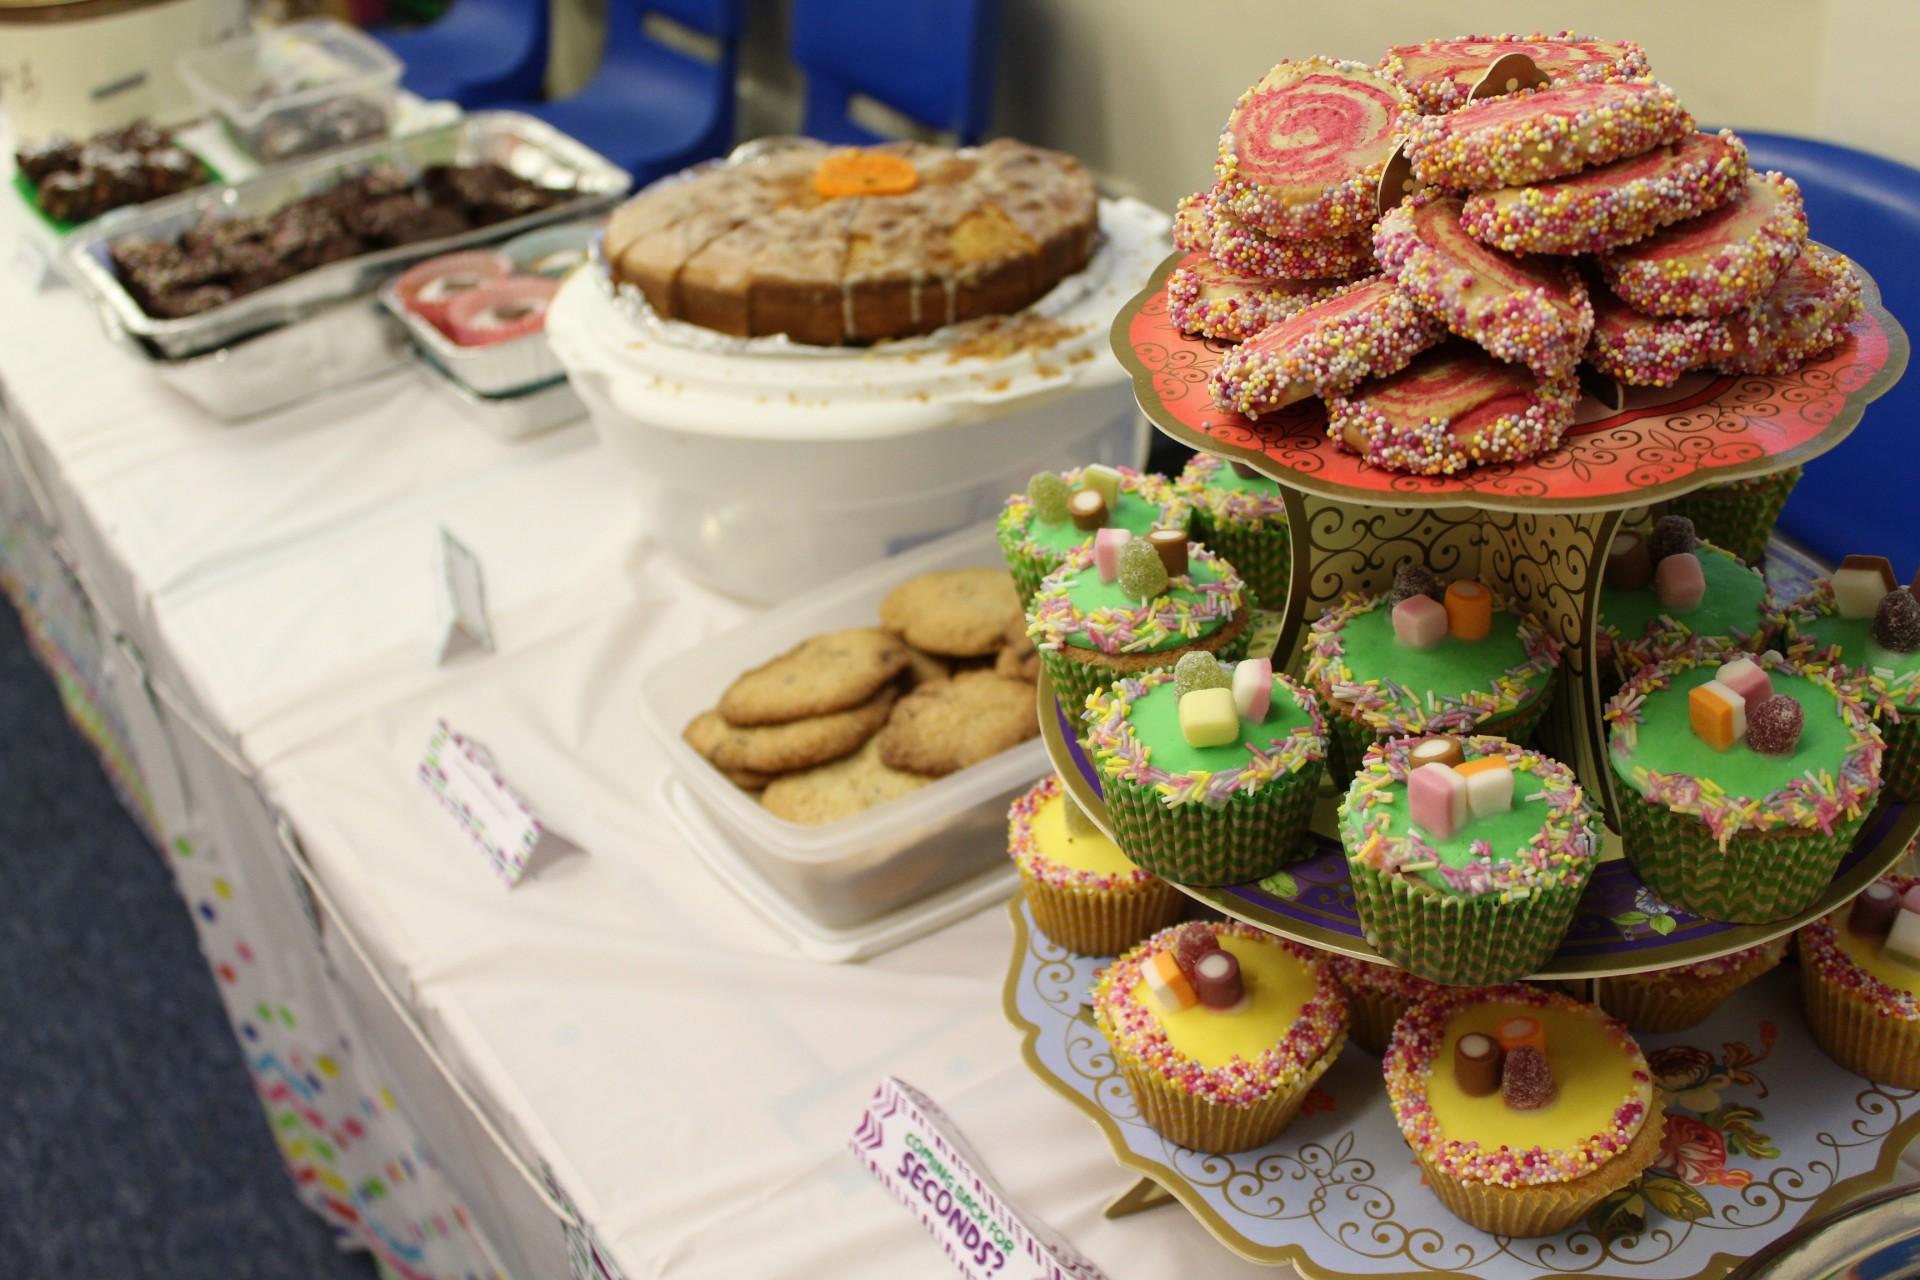 Form 6 host a Macmillan Bake Sale.